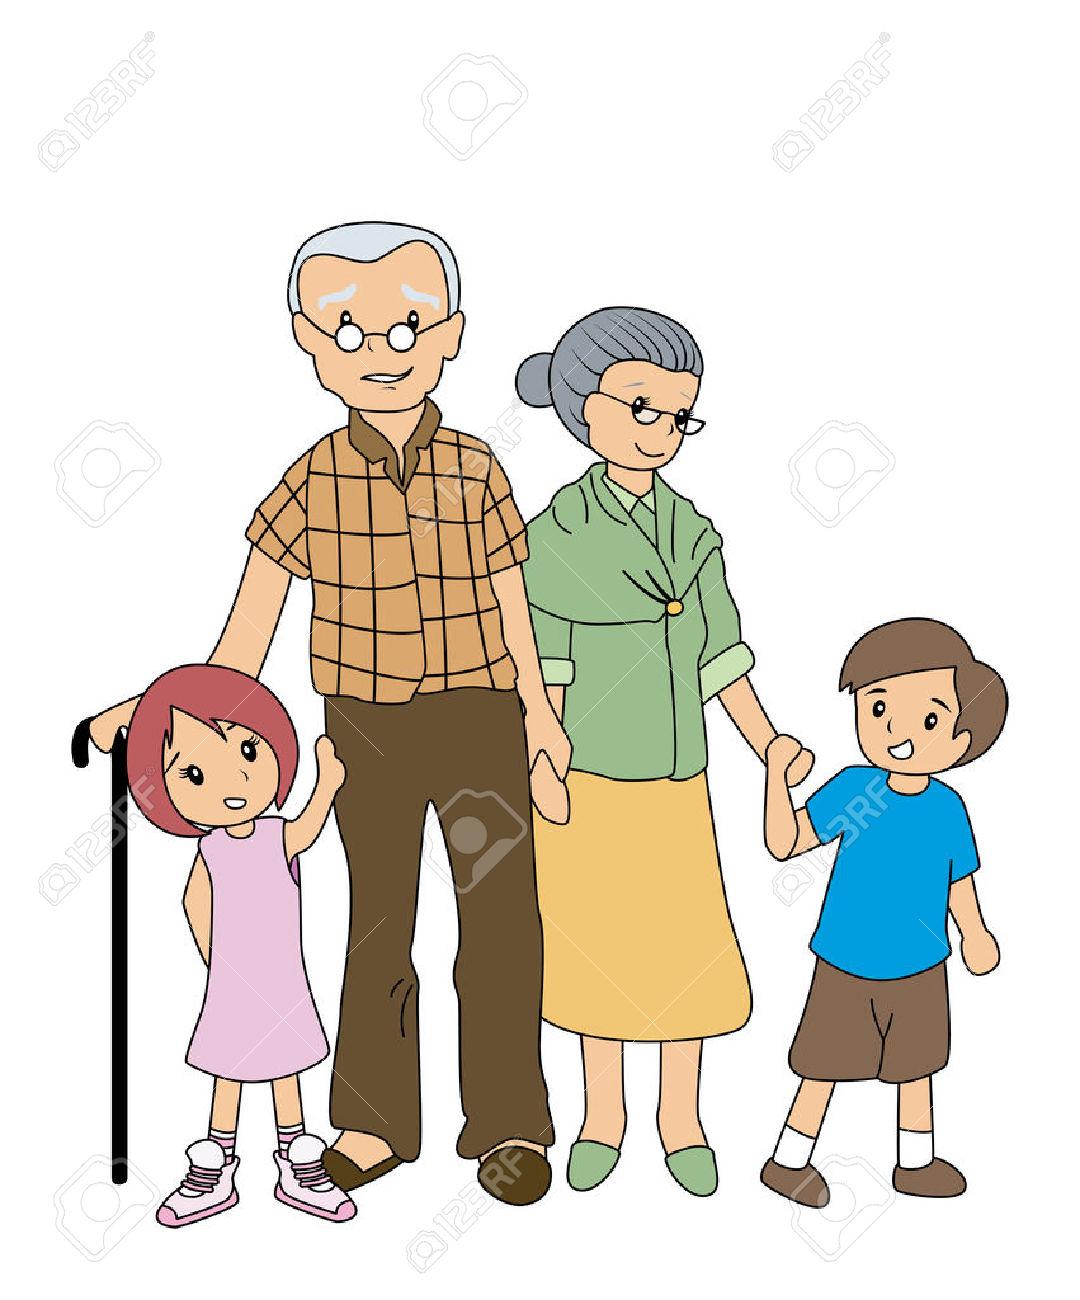 clipart freeuse download Grandparent clipart kid clipart. Children with grandparents panda